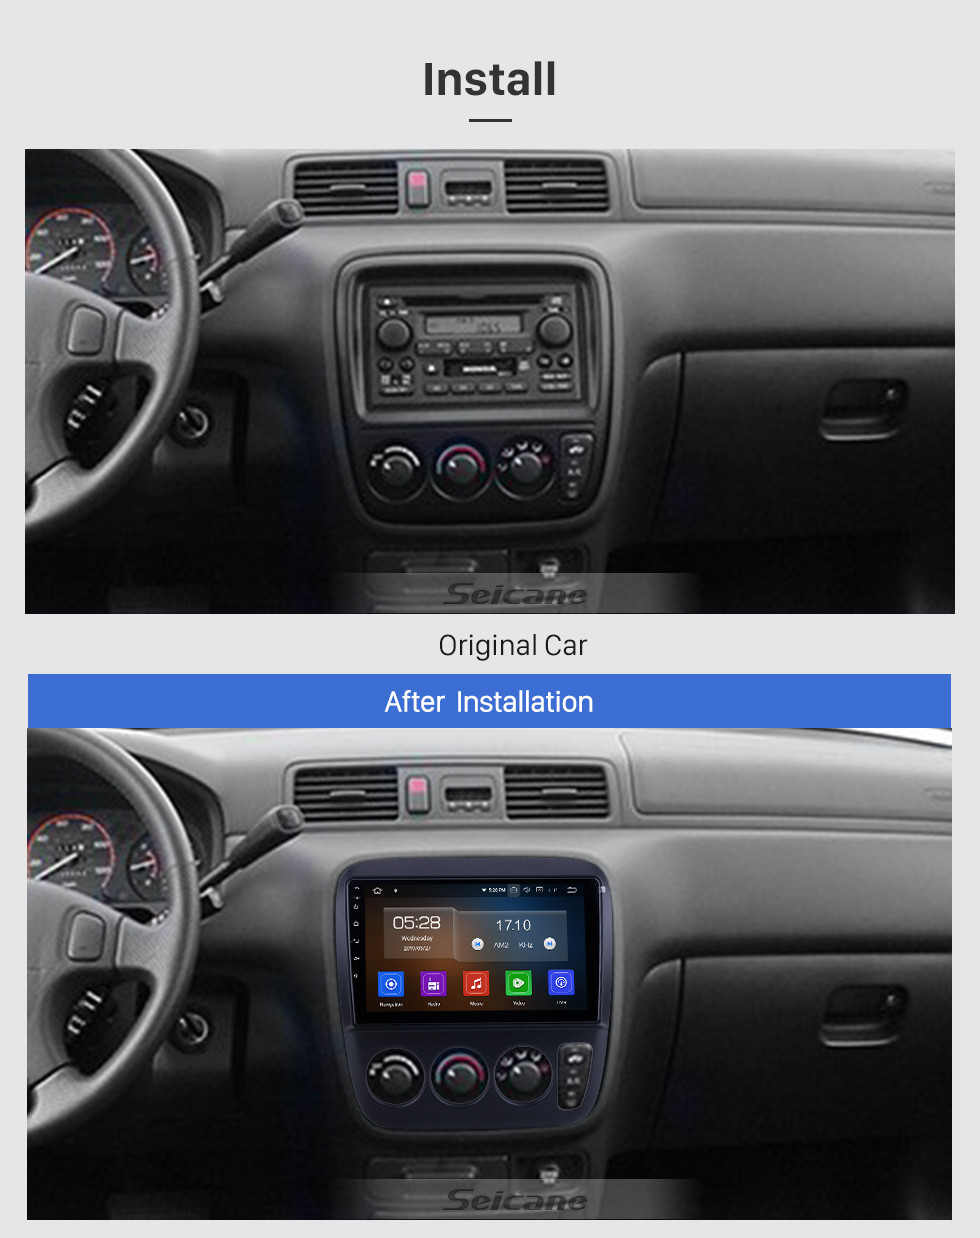 Seicane 9 inch For 1998 1999 2000 Honda CR-V Performa RHD Radio Android 10.0 GPS Navigation System Bluetooth HD Touchscreen Carplay support OBD2